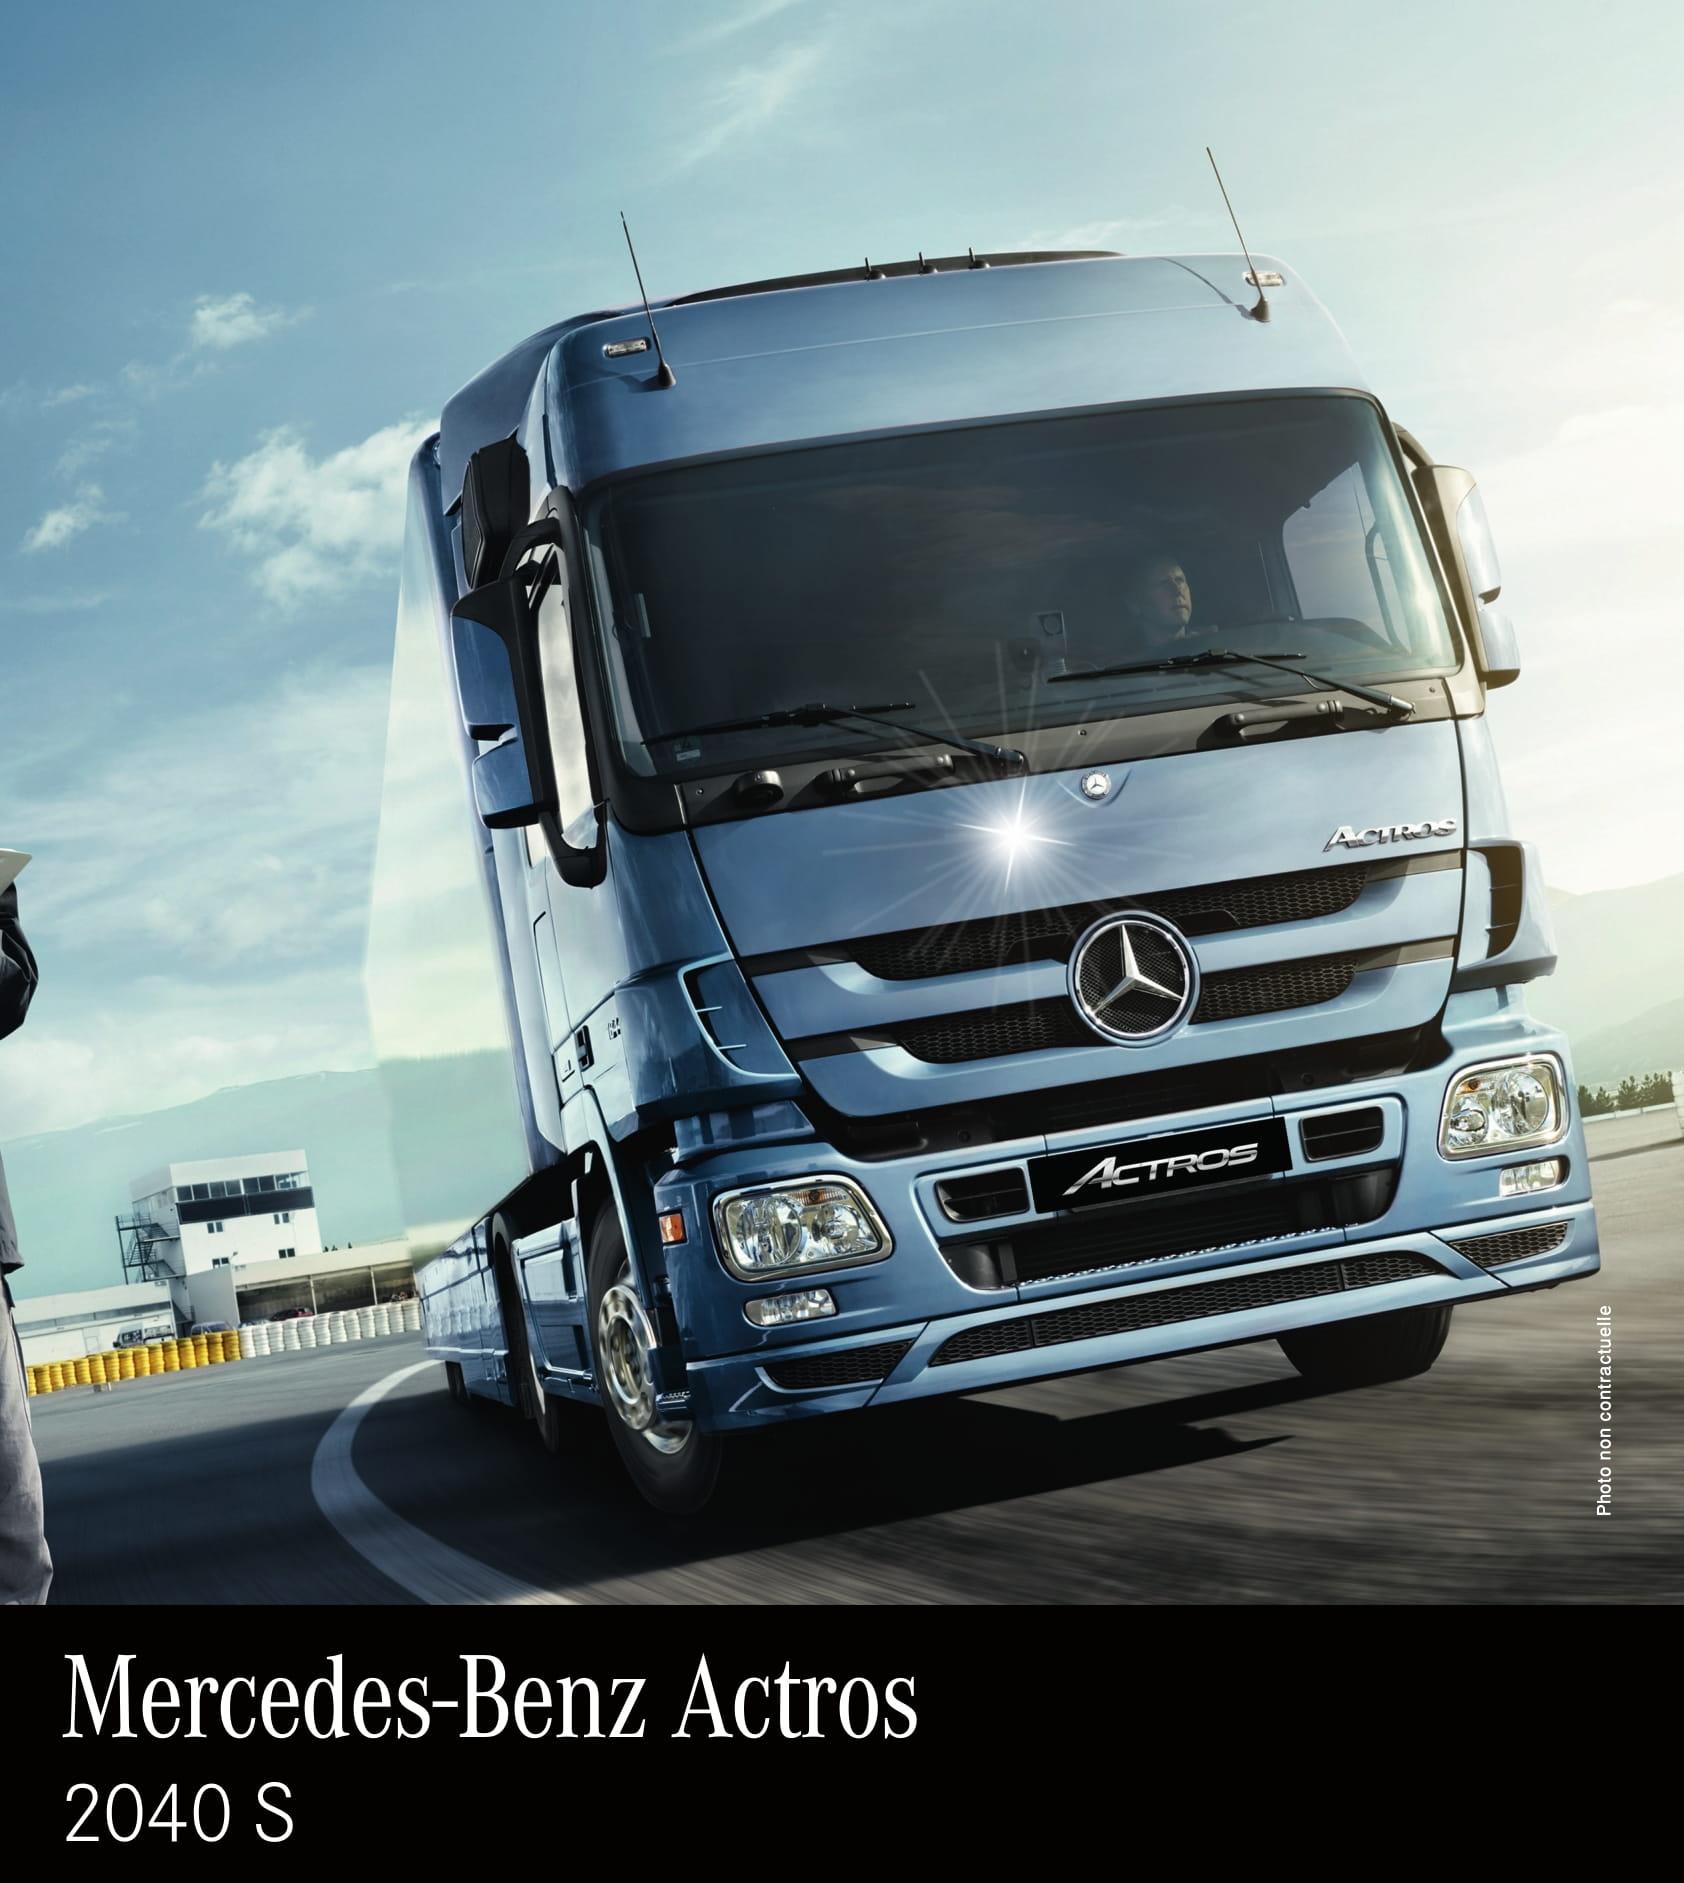 Prix camion Mercedes-Benz-Actros-2040S-Tracteur-routier-Tunisie